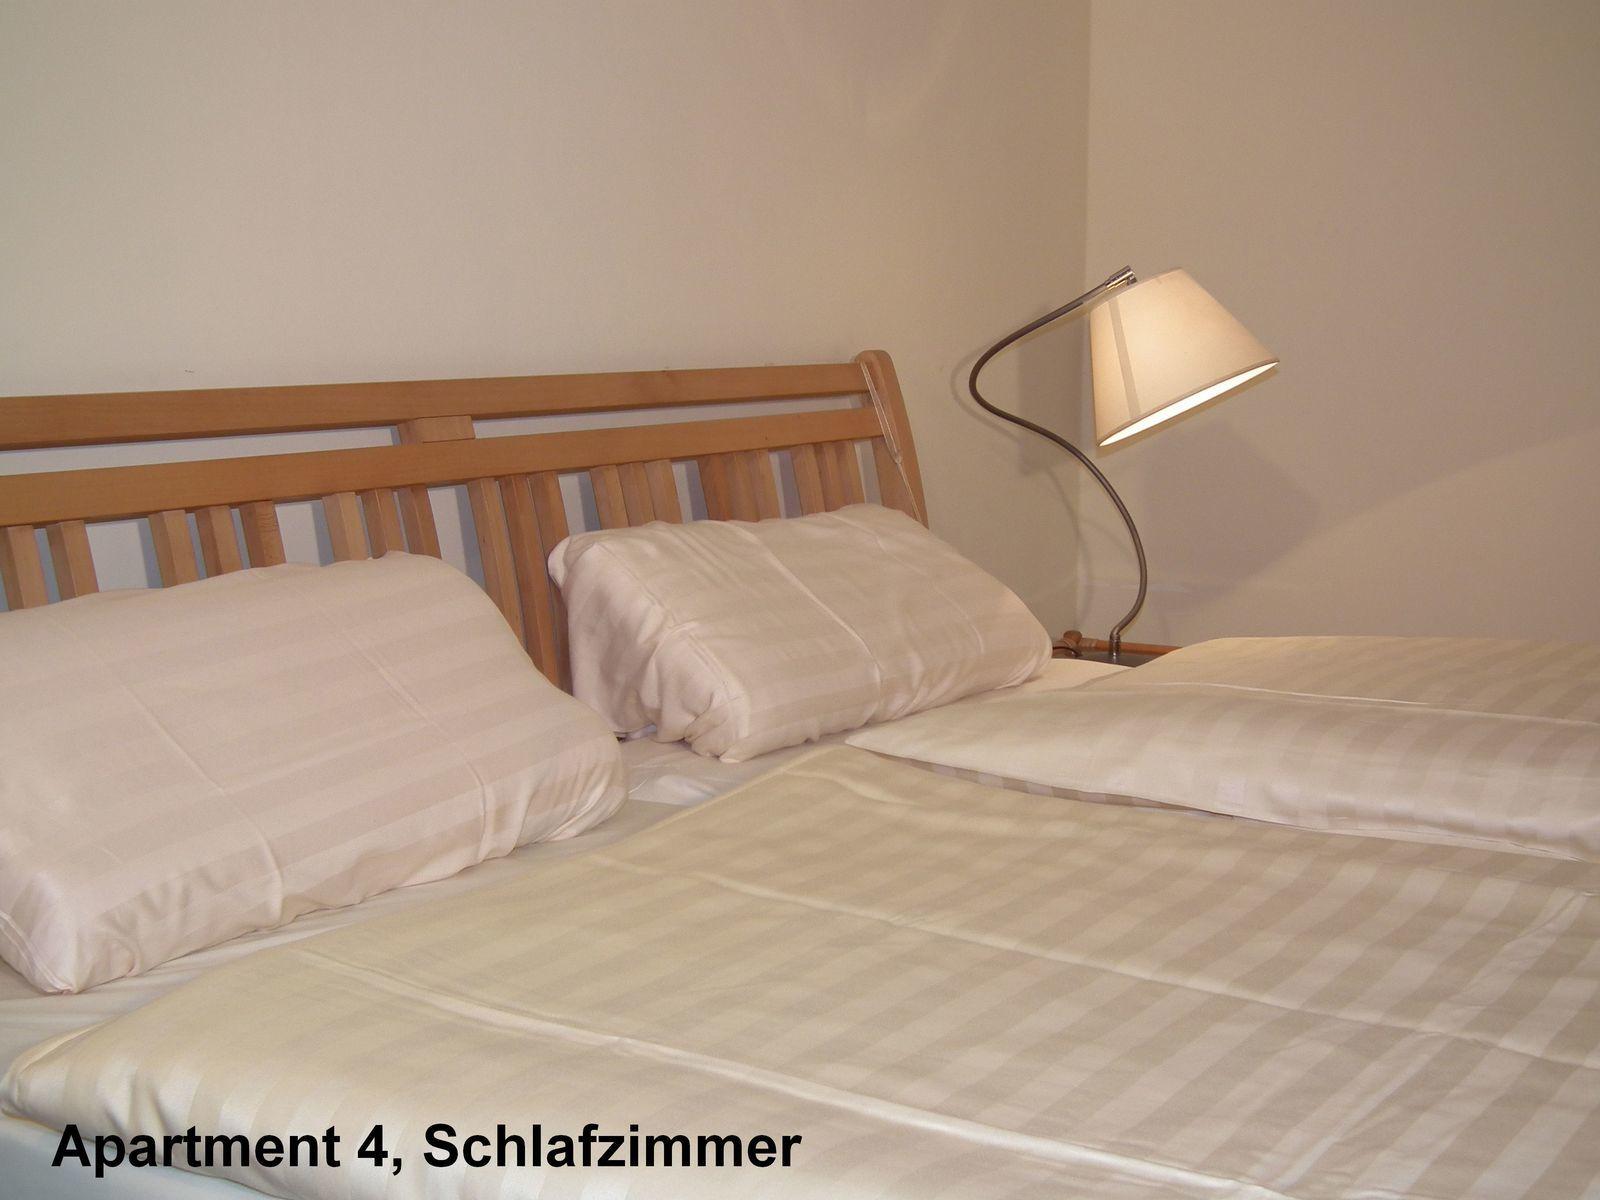 Appartement - Haus Merian 4